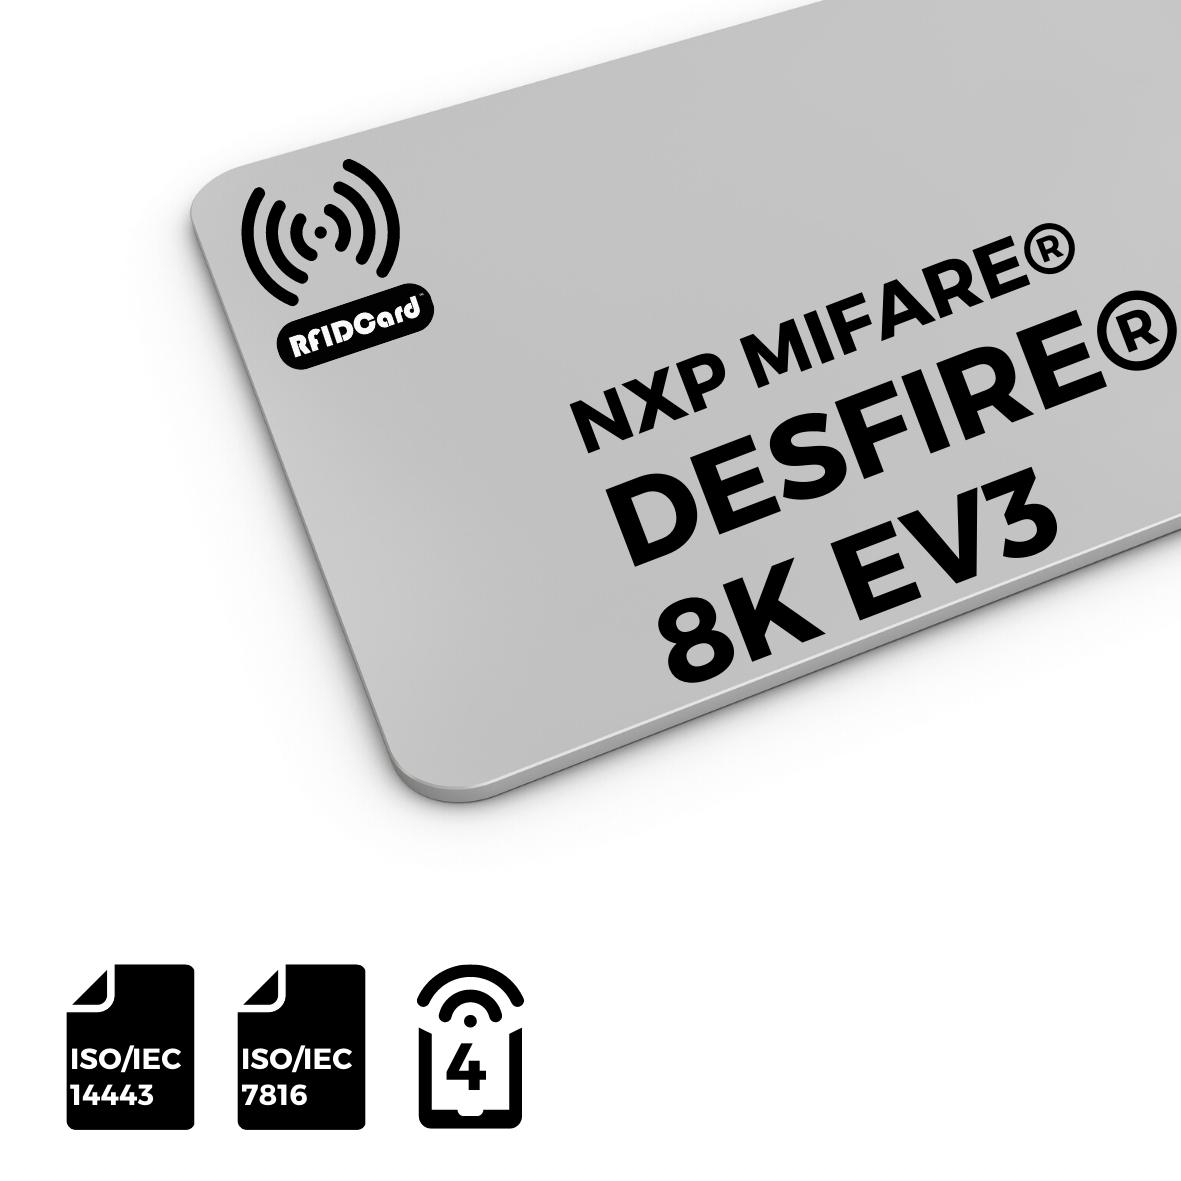 RFID NFC Card NXP MIFARE®DESFire®8k EV3